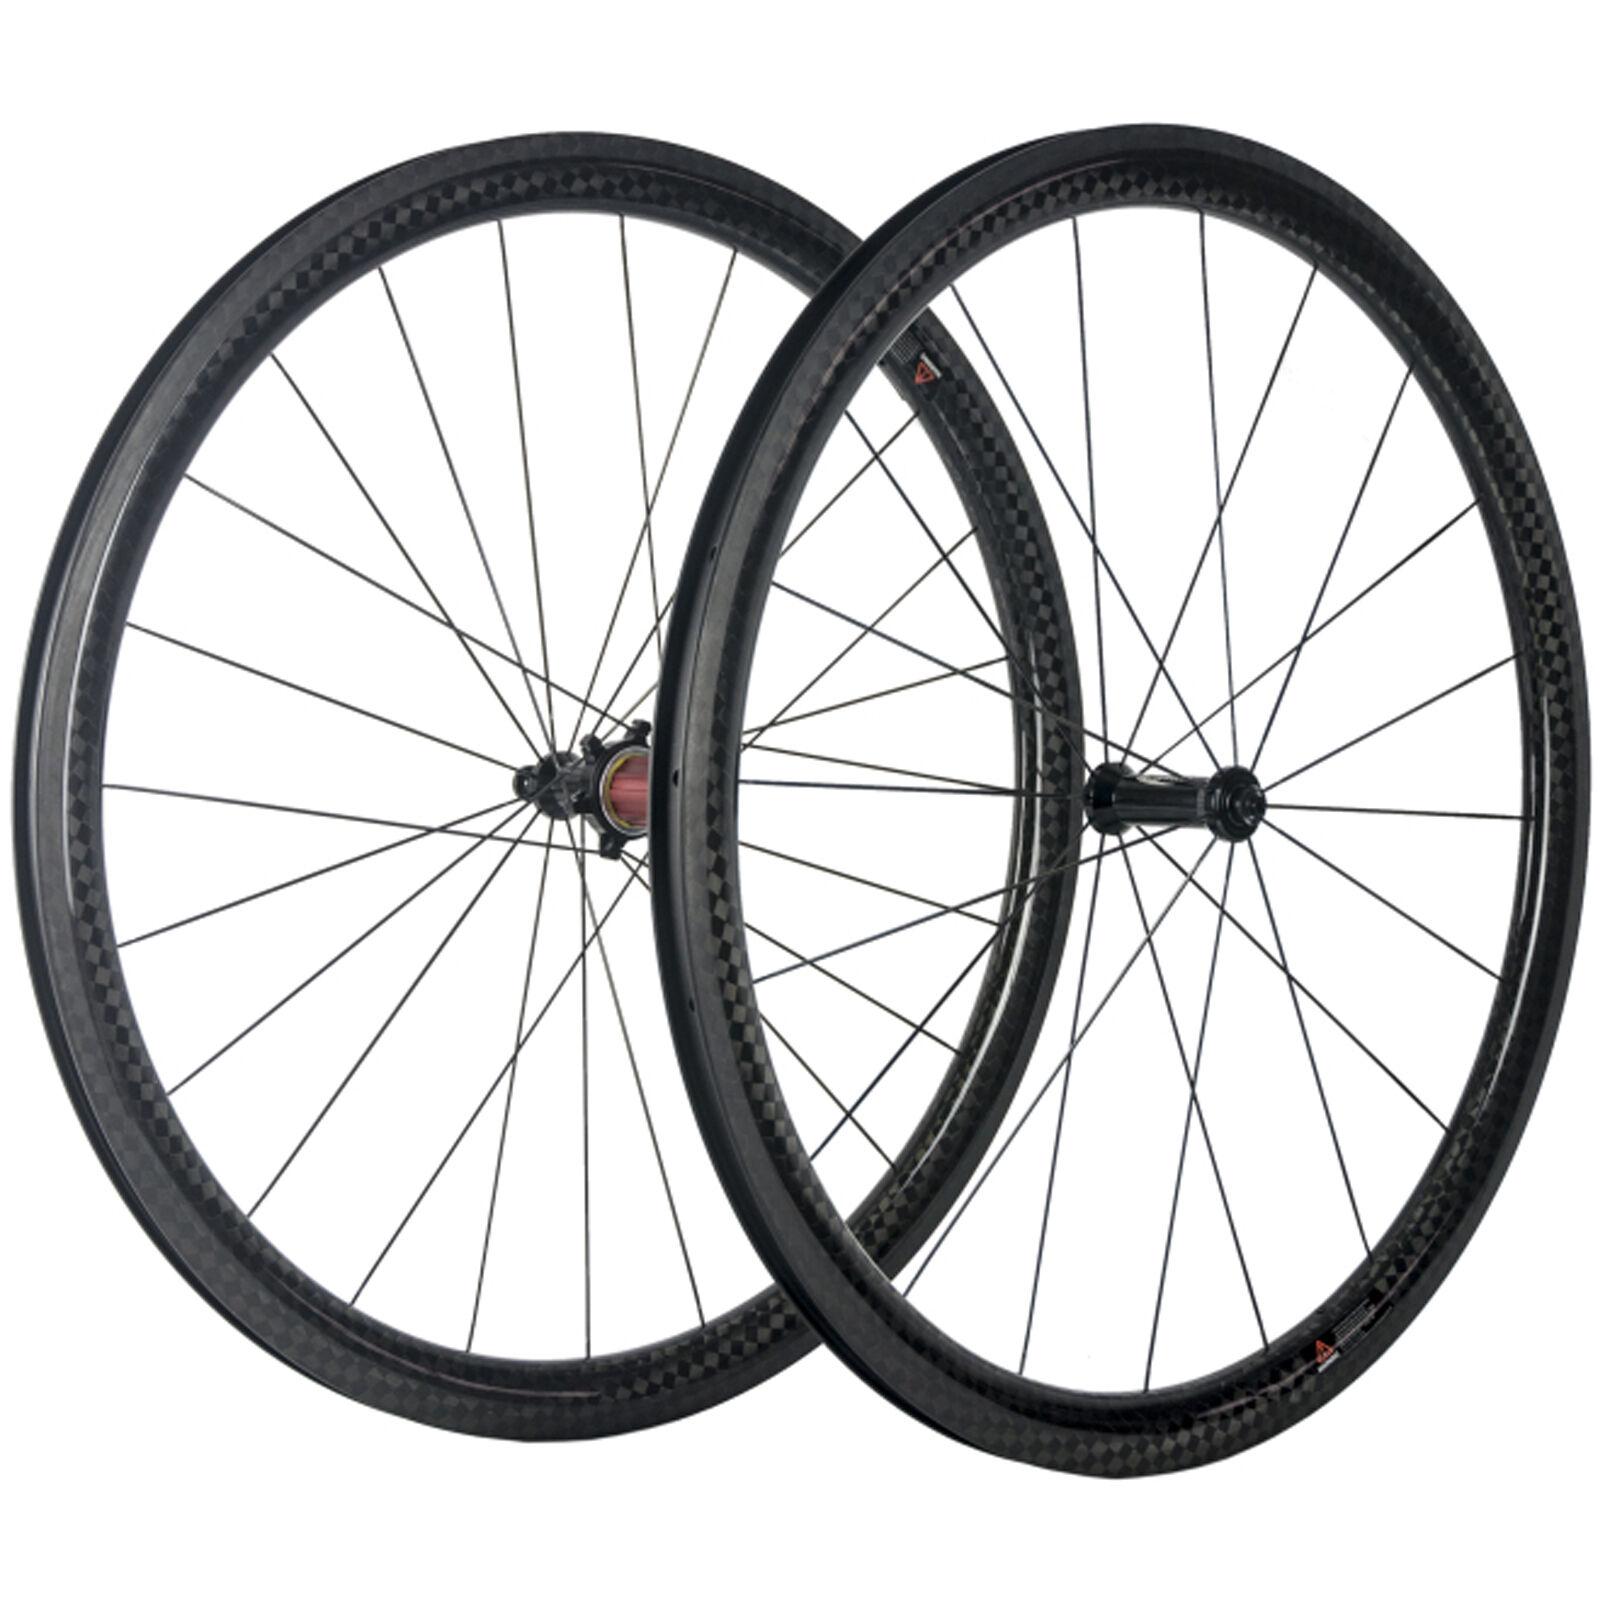 Carbon Clincher Wheels 12K 38mm Carbon Road Bike Wheelset Sapim R13 25mm Width